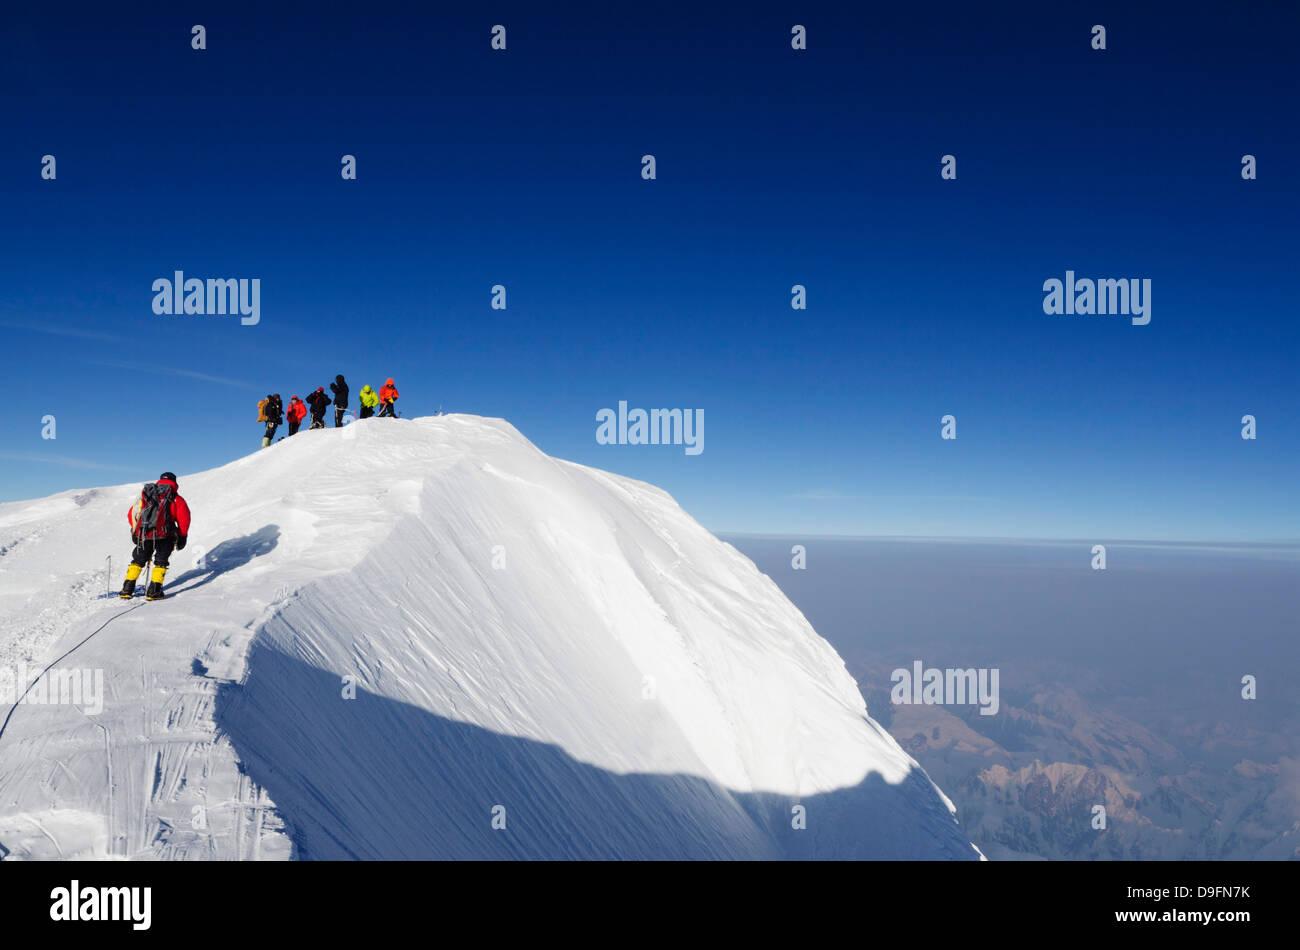 Summit ridge, climbing expedition on Mount McKinley, 6194m, Denali National Park, Alaska, USA - Stock Image